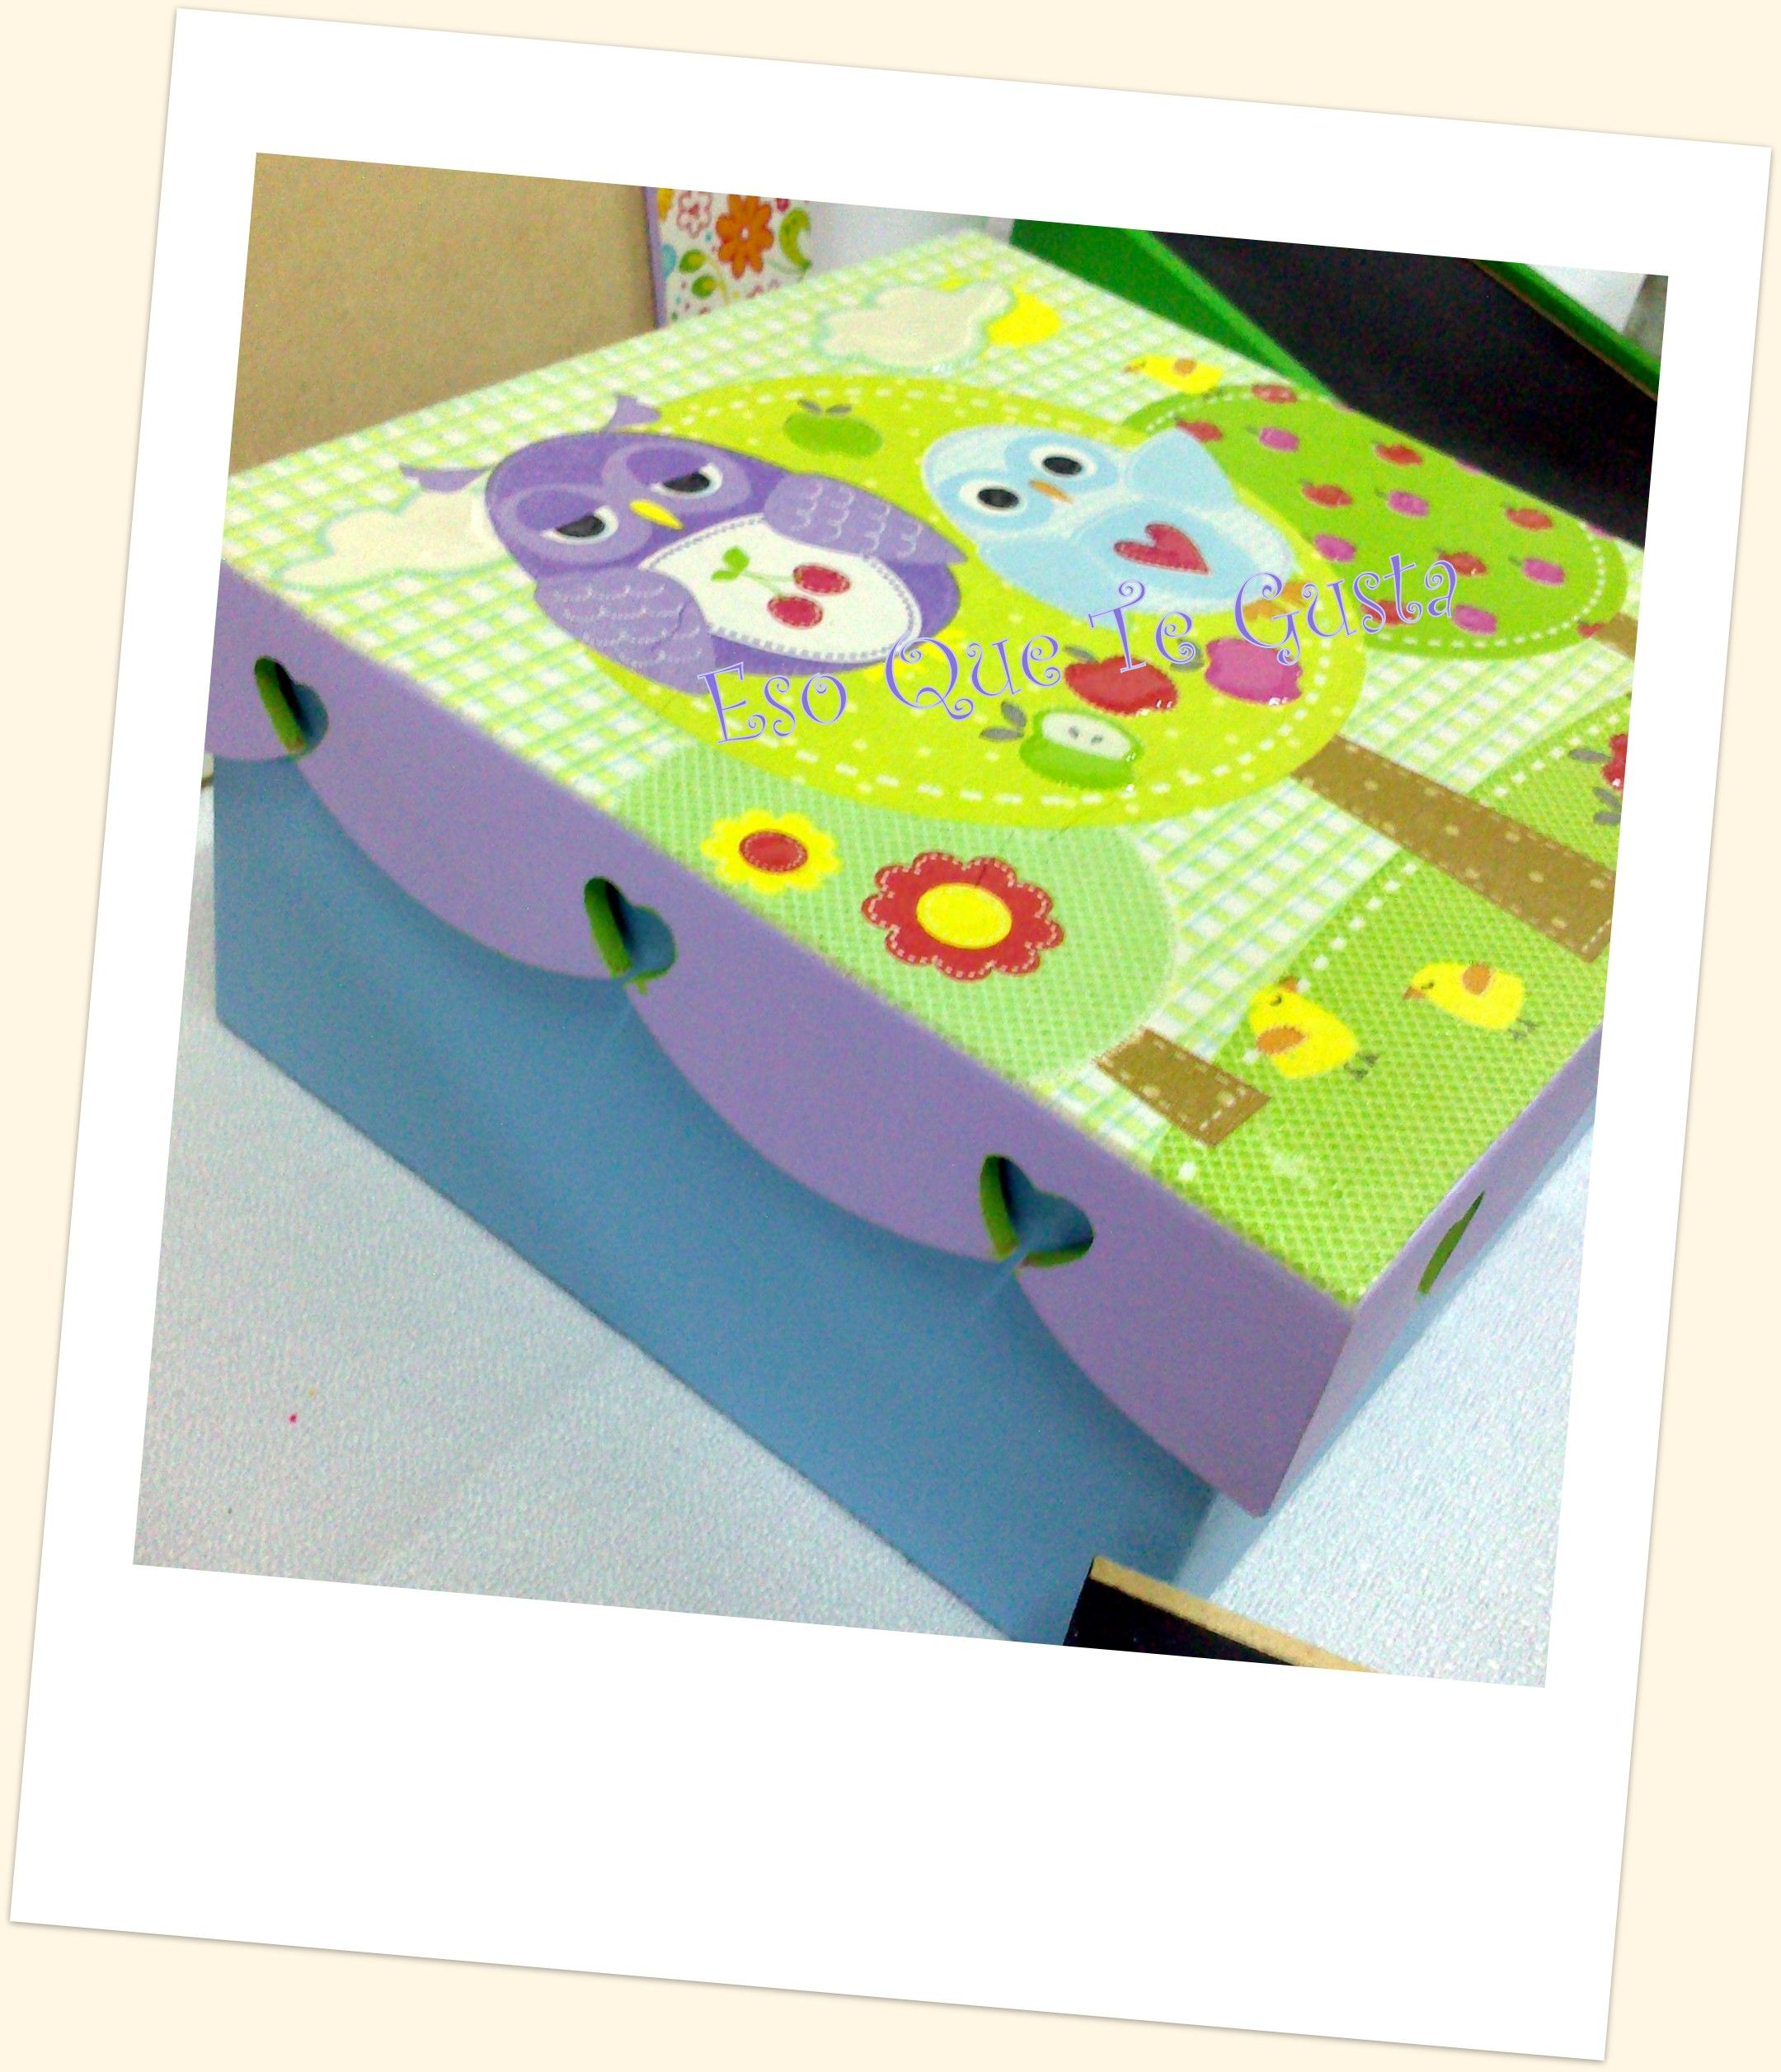 Caja lechuzas maderitas pinterest lechuzas cajas y for Caja bankia oficina internet